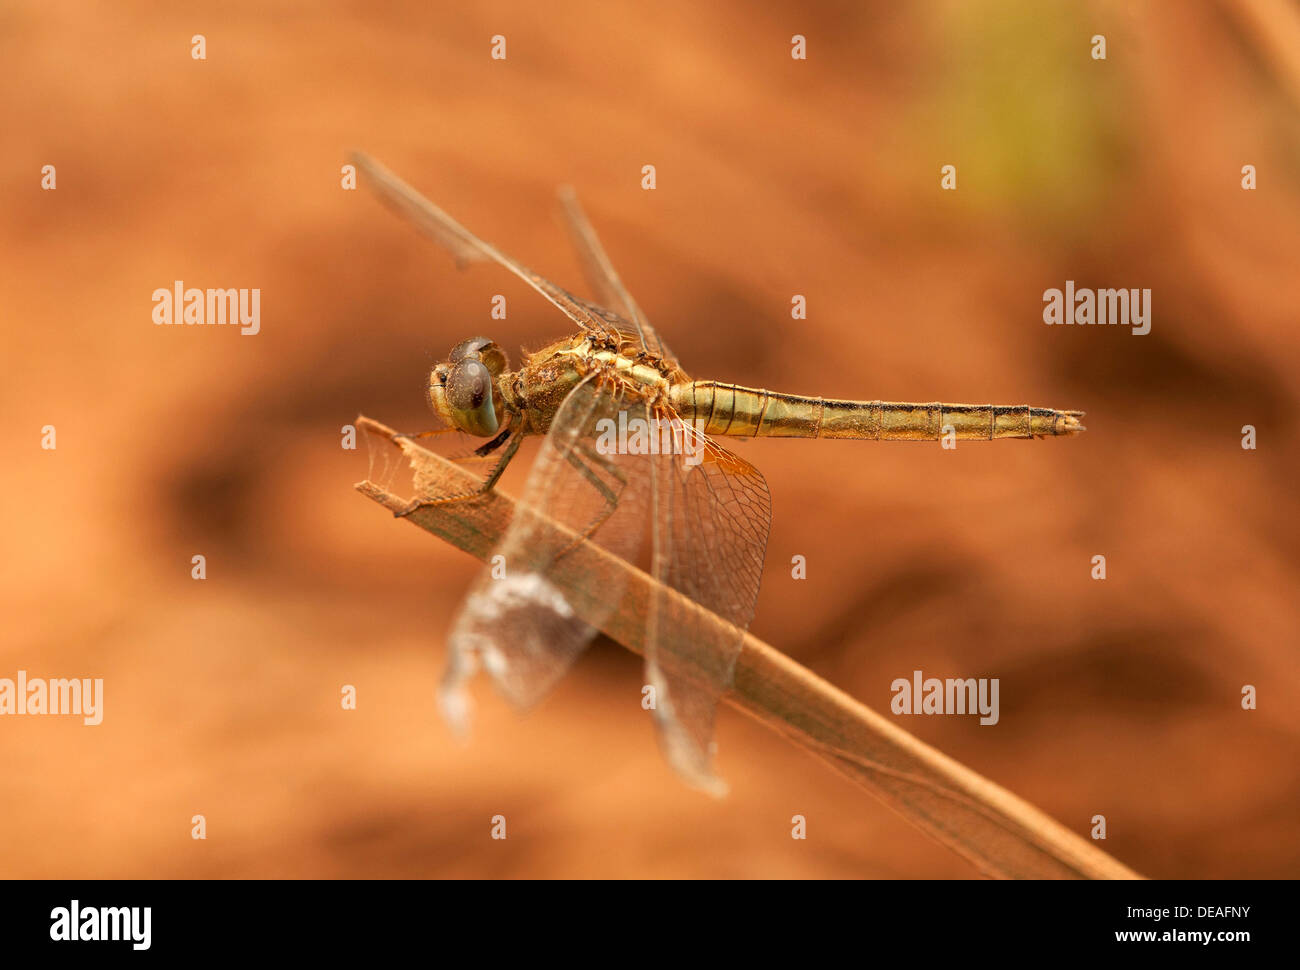 Dragonfly, Scarlet Skimmer or Crimson Darter (Crocothemis sevillia), female, Battambang, Cambodia, Asia - Stock Image